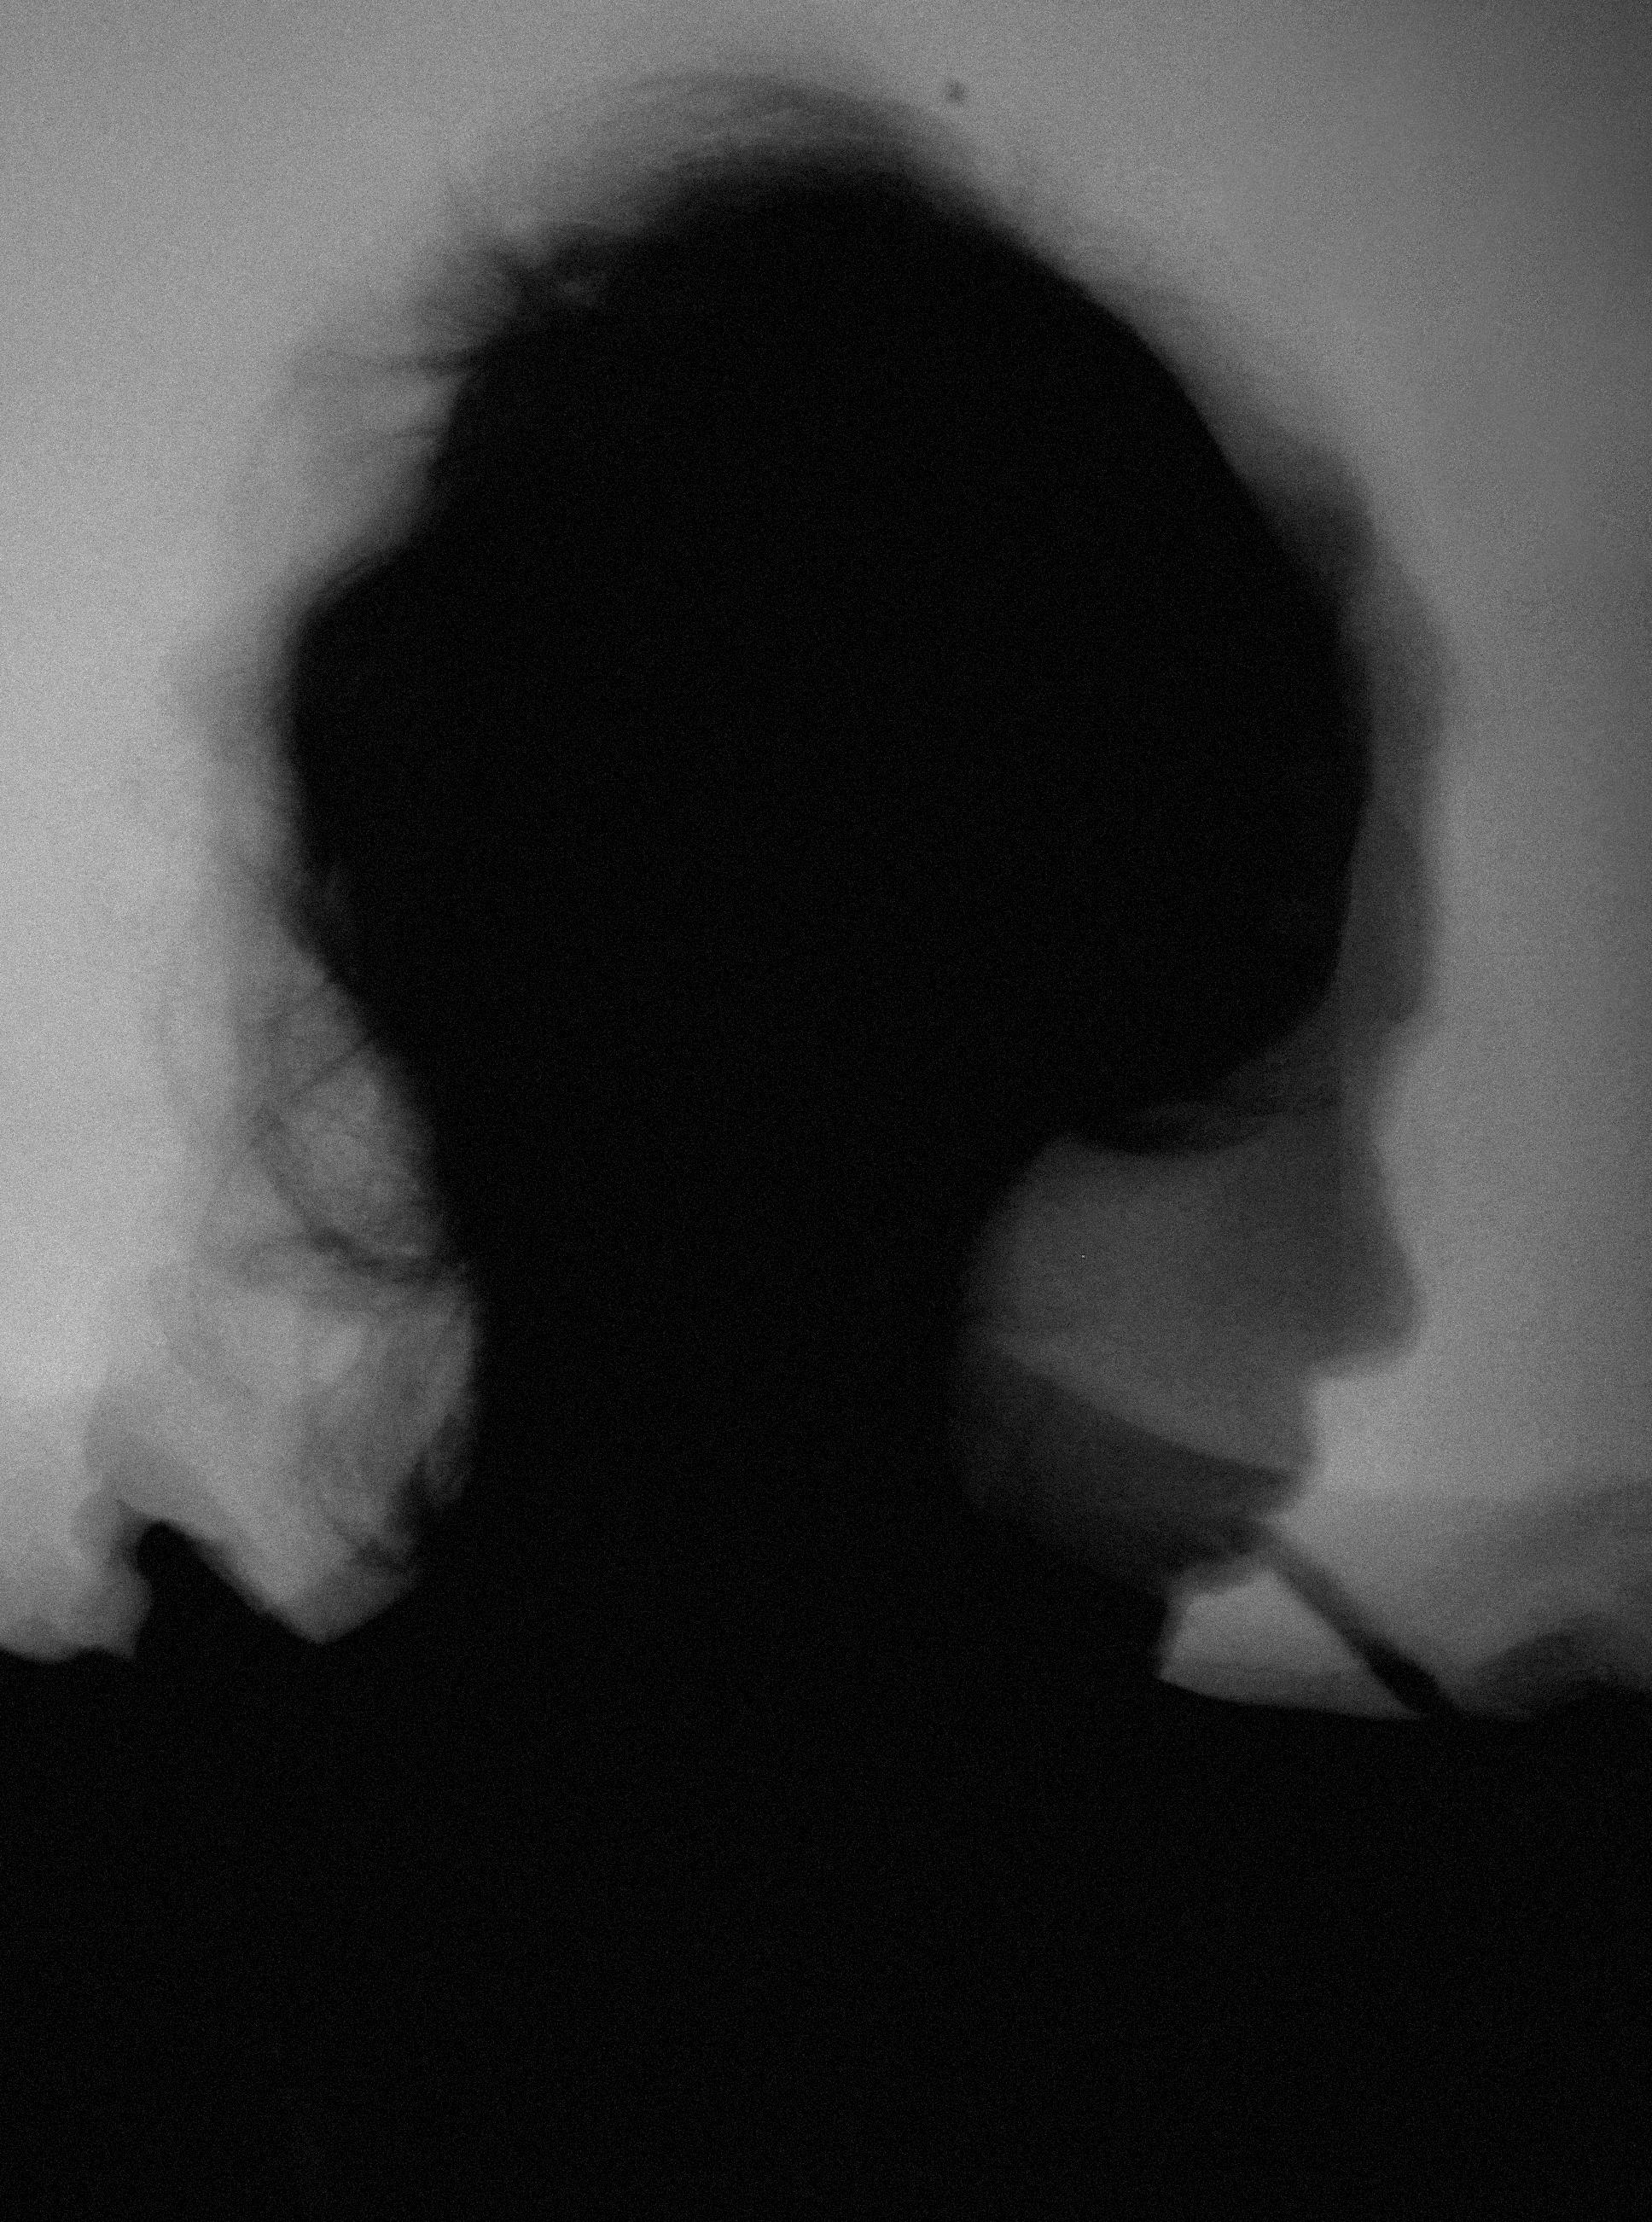 © Patrizia Blek | Boundaries